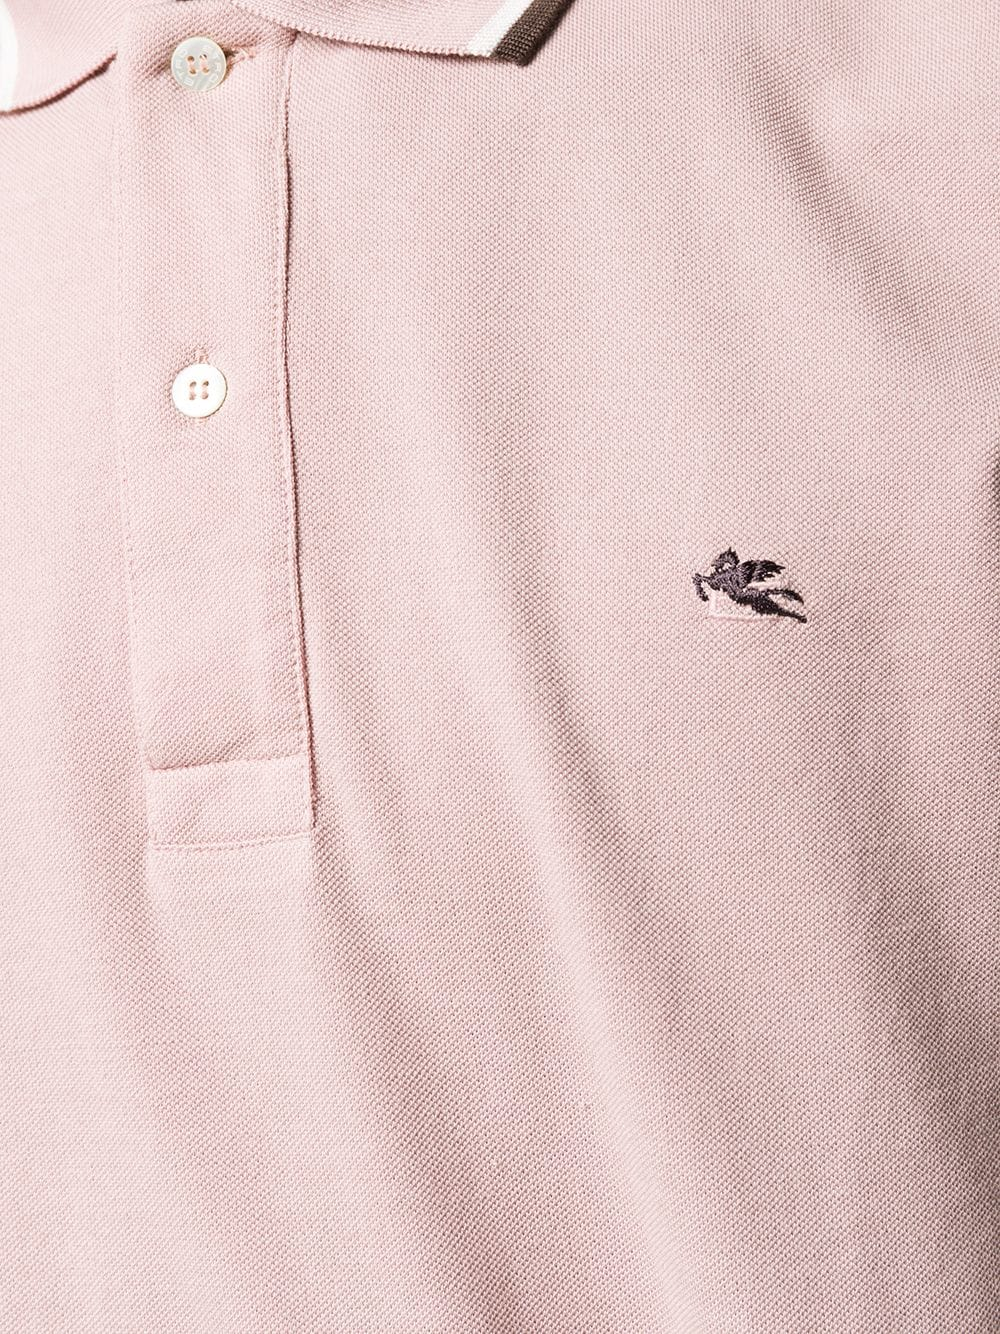 abac3d571 Polo Shirt With Striped Hem - ETRO - Russocapri